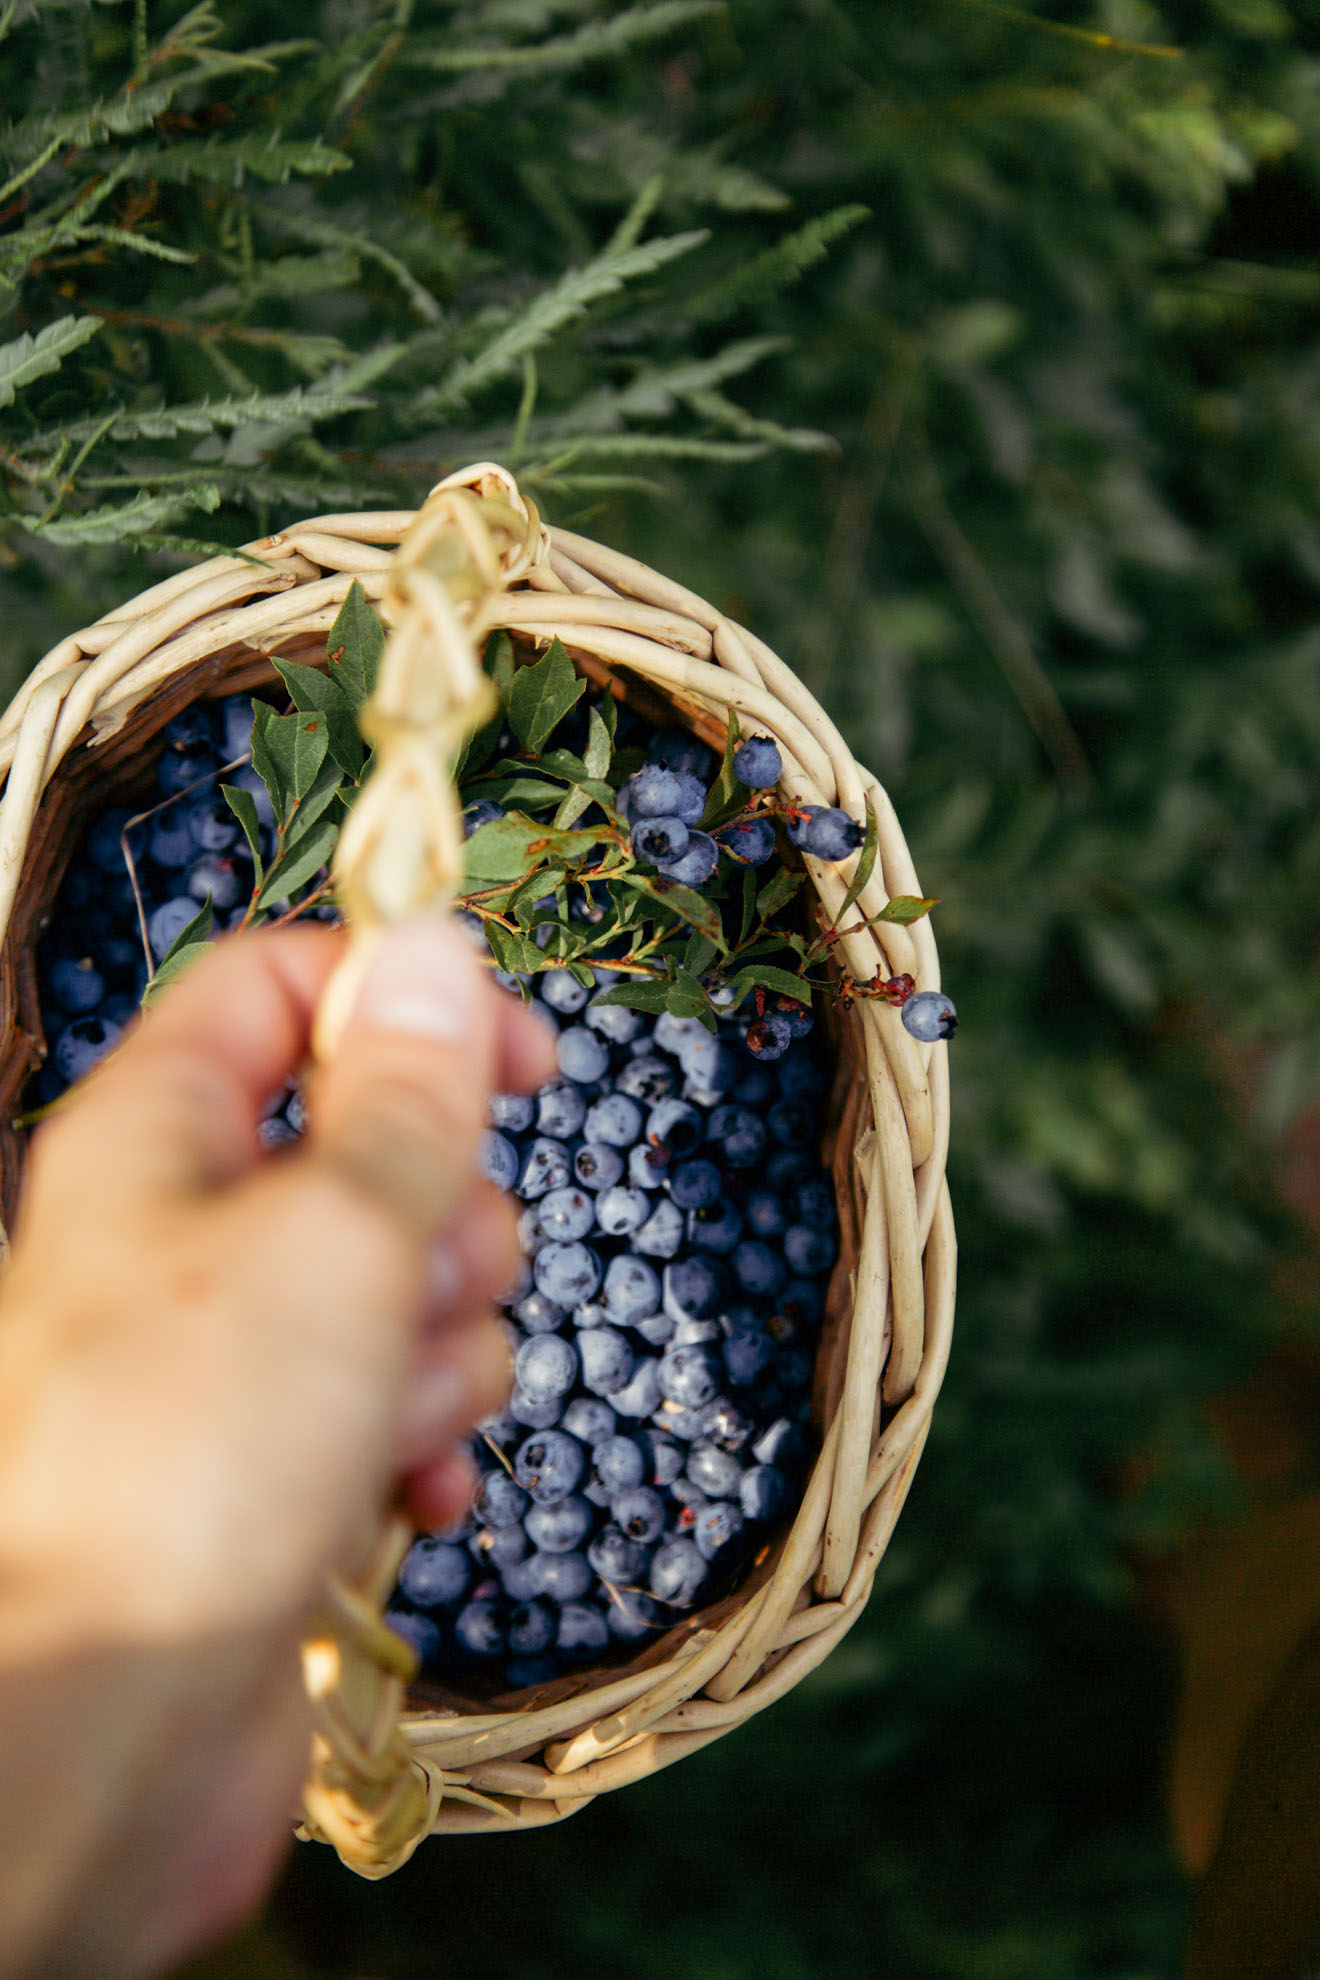 Blueberry Picking   Miss Northerner